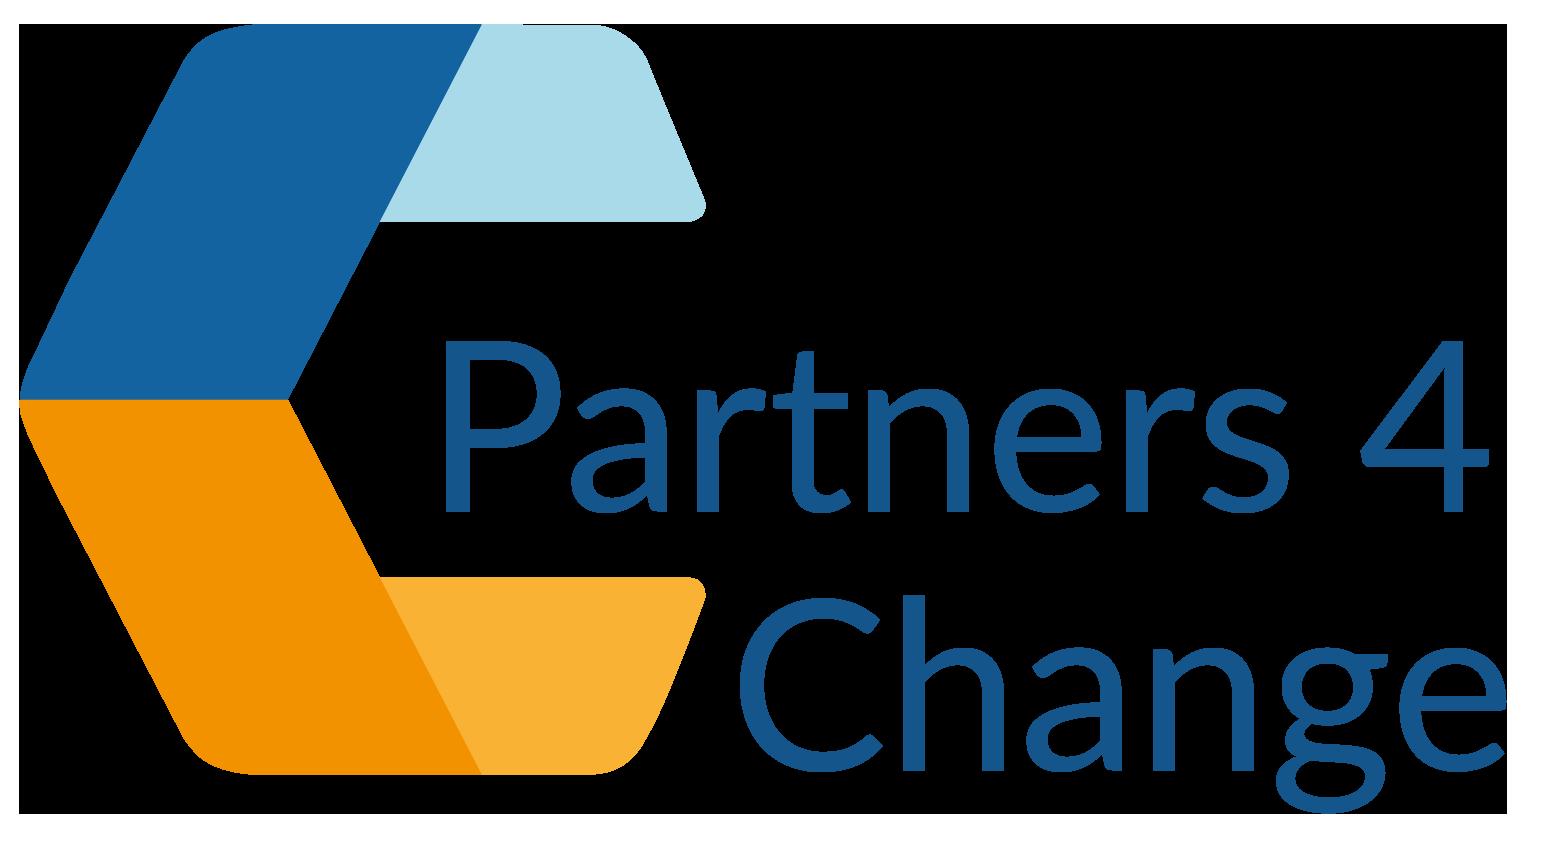 Partners 4 Change